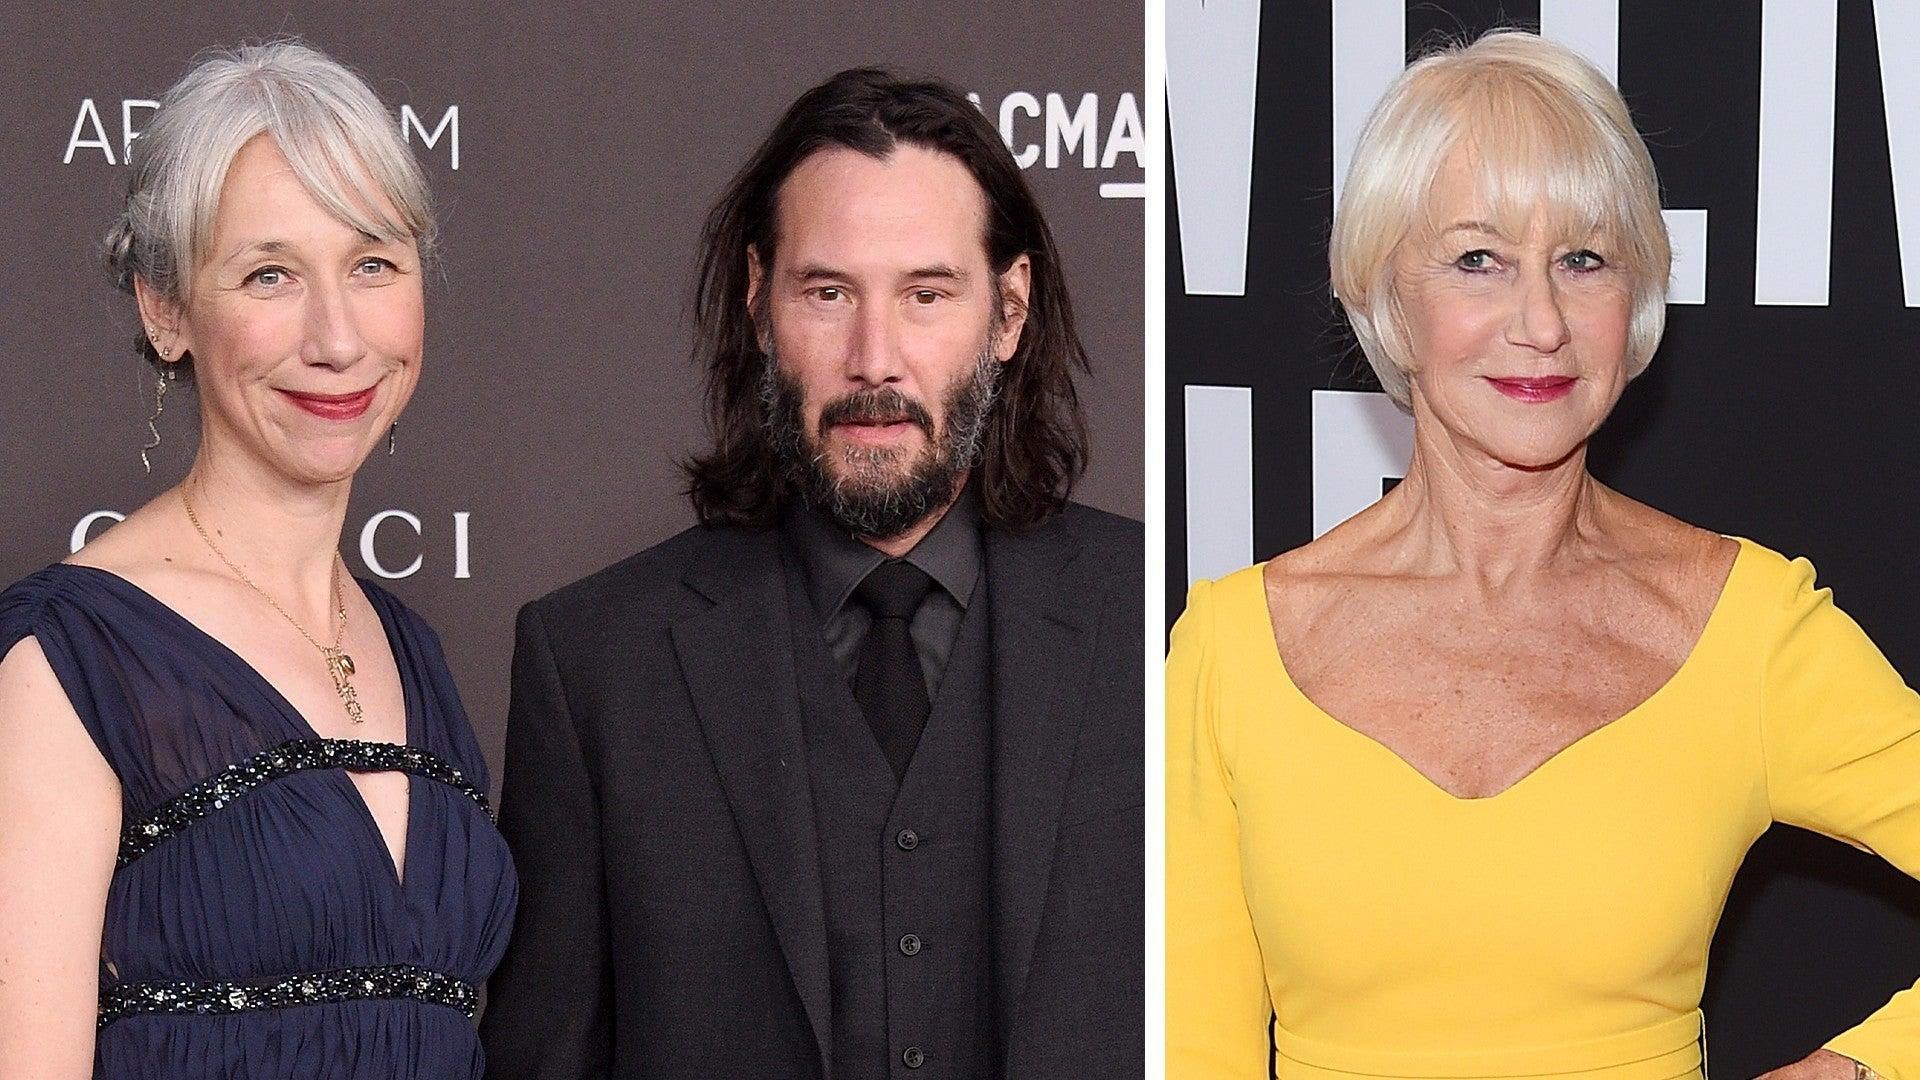 Helen Mirren Says It Was Very Flattering To Be Mistaken For Keanu Reeves Girlfriend Exclusive Entertainment Tonight